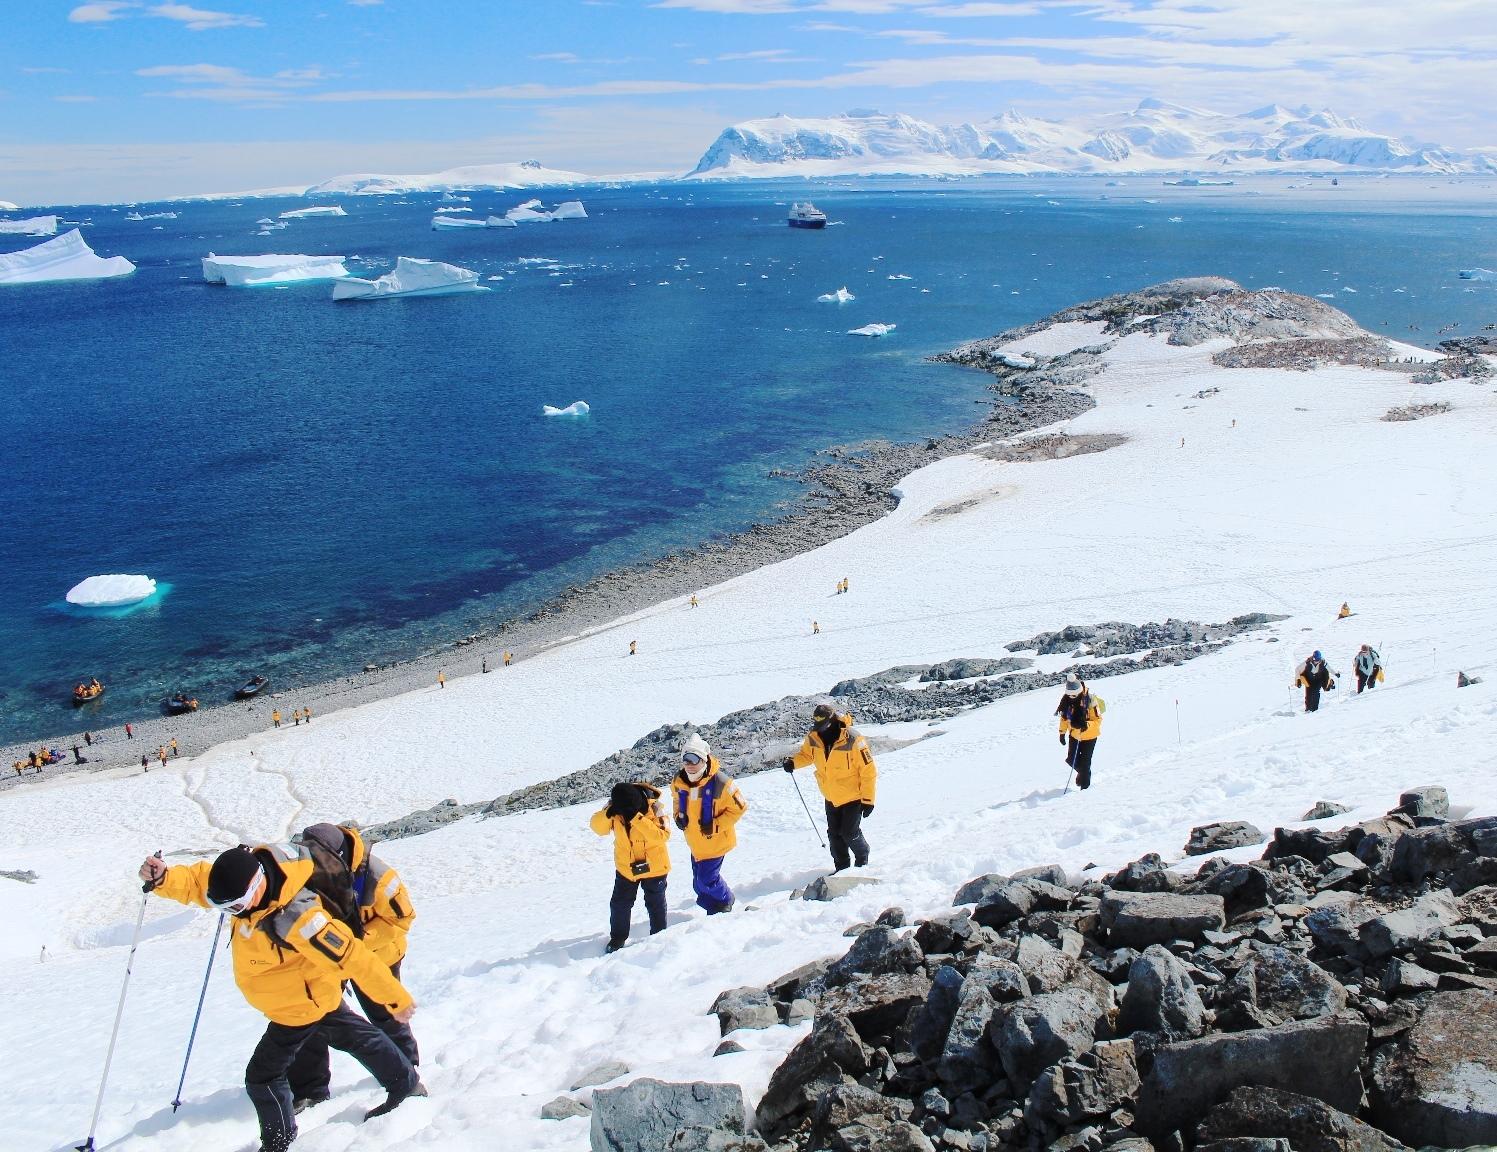 1月5日出発「南極半島探検クルーズ 16日間」